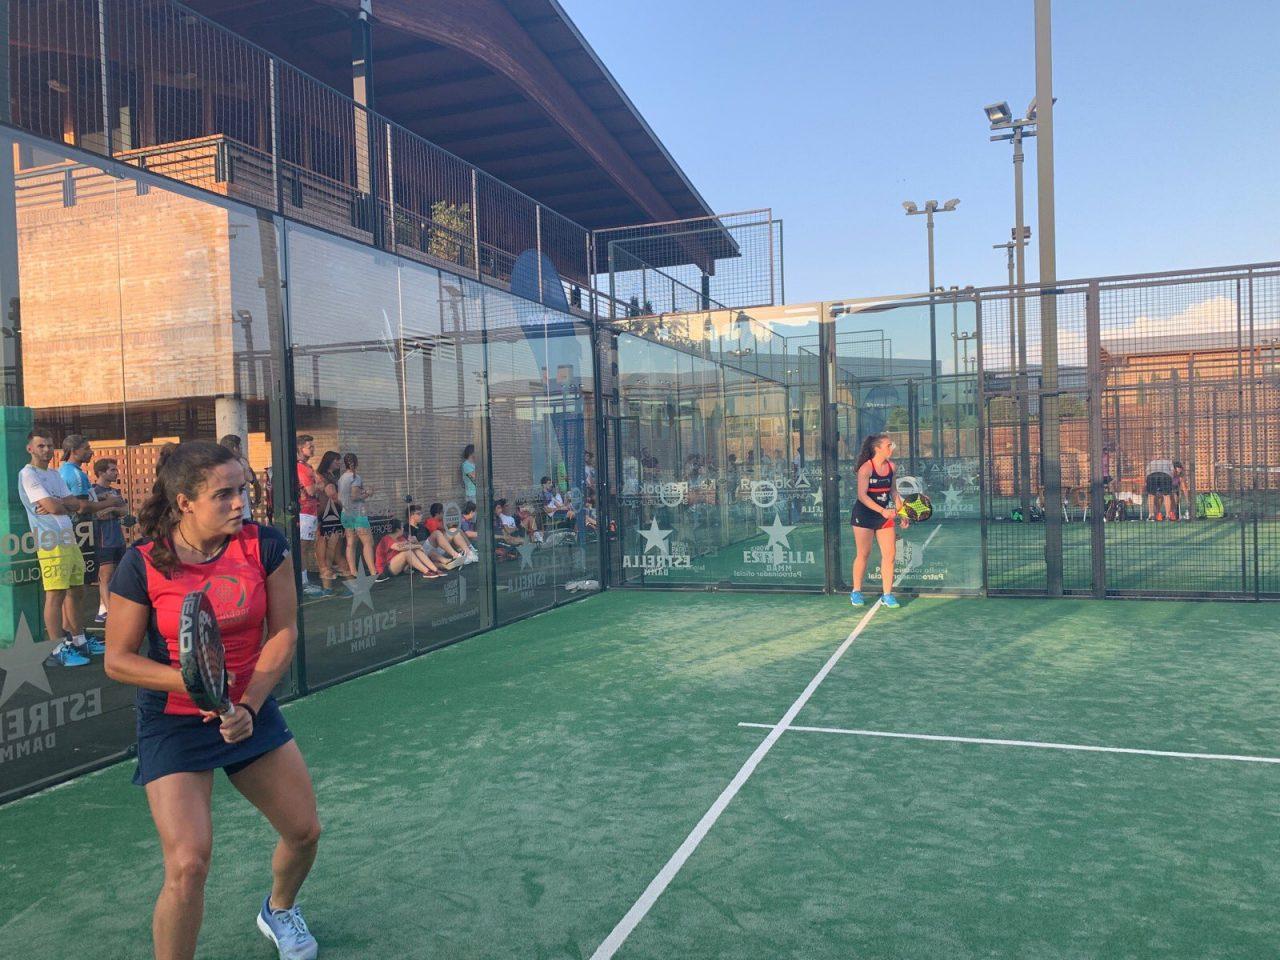 subcampeonas campeonato espana padel sub 23 2019